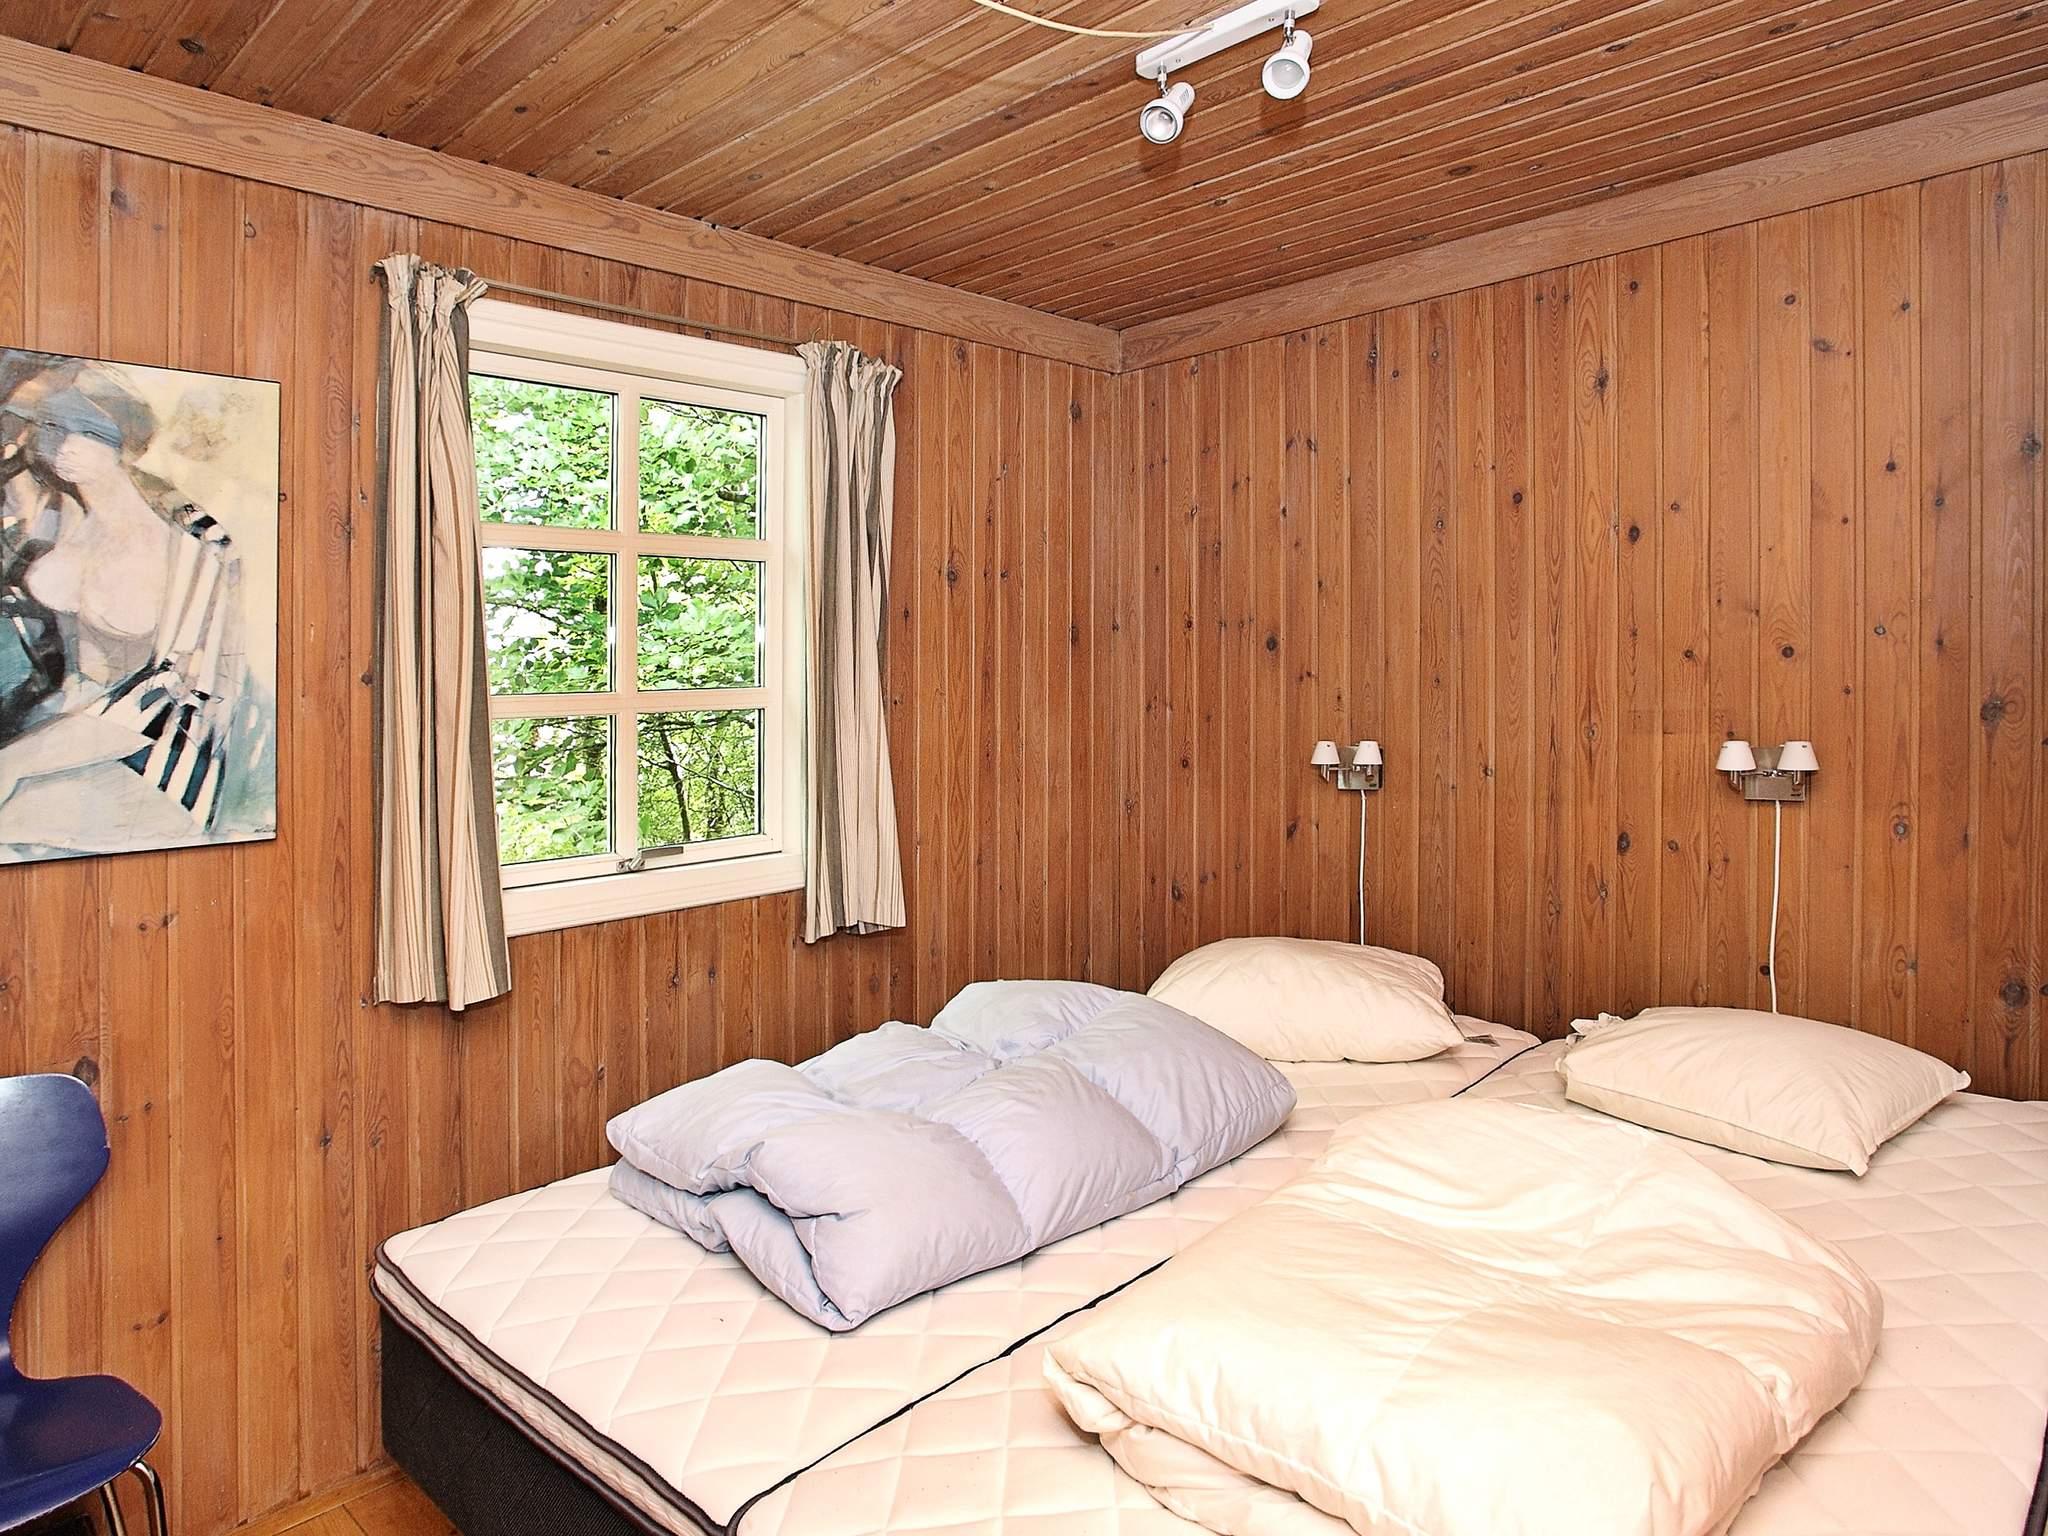 Ferienhaus Virksund (82997), Virksund, , Limfjord, Dänemark, Bild 8